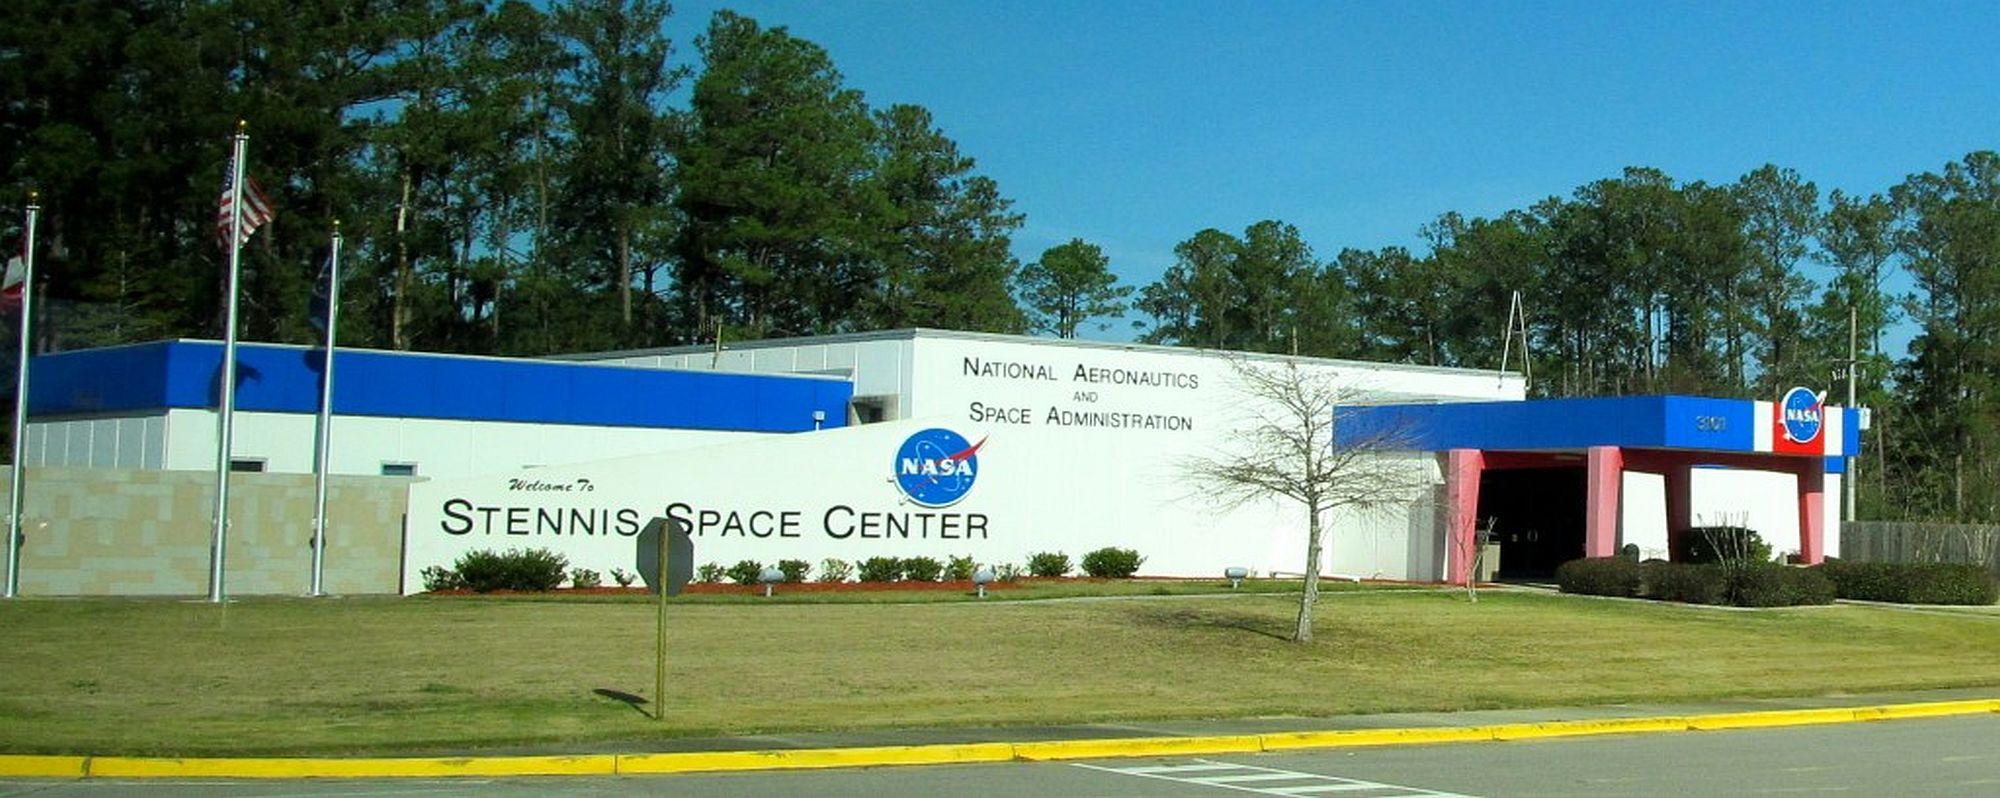 NASA Stennis Space Center Tour